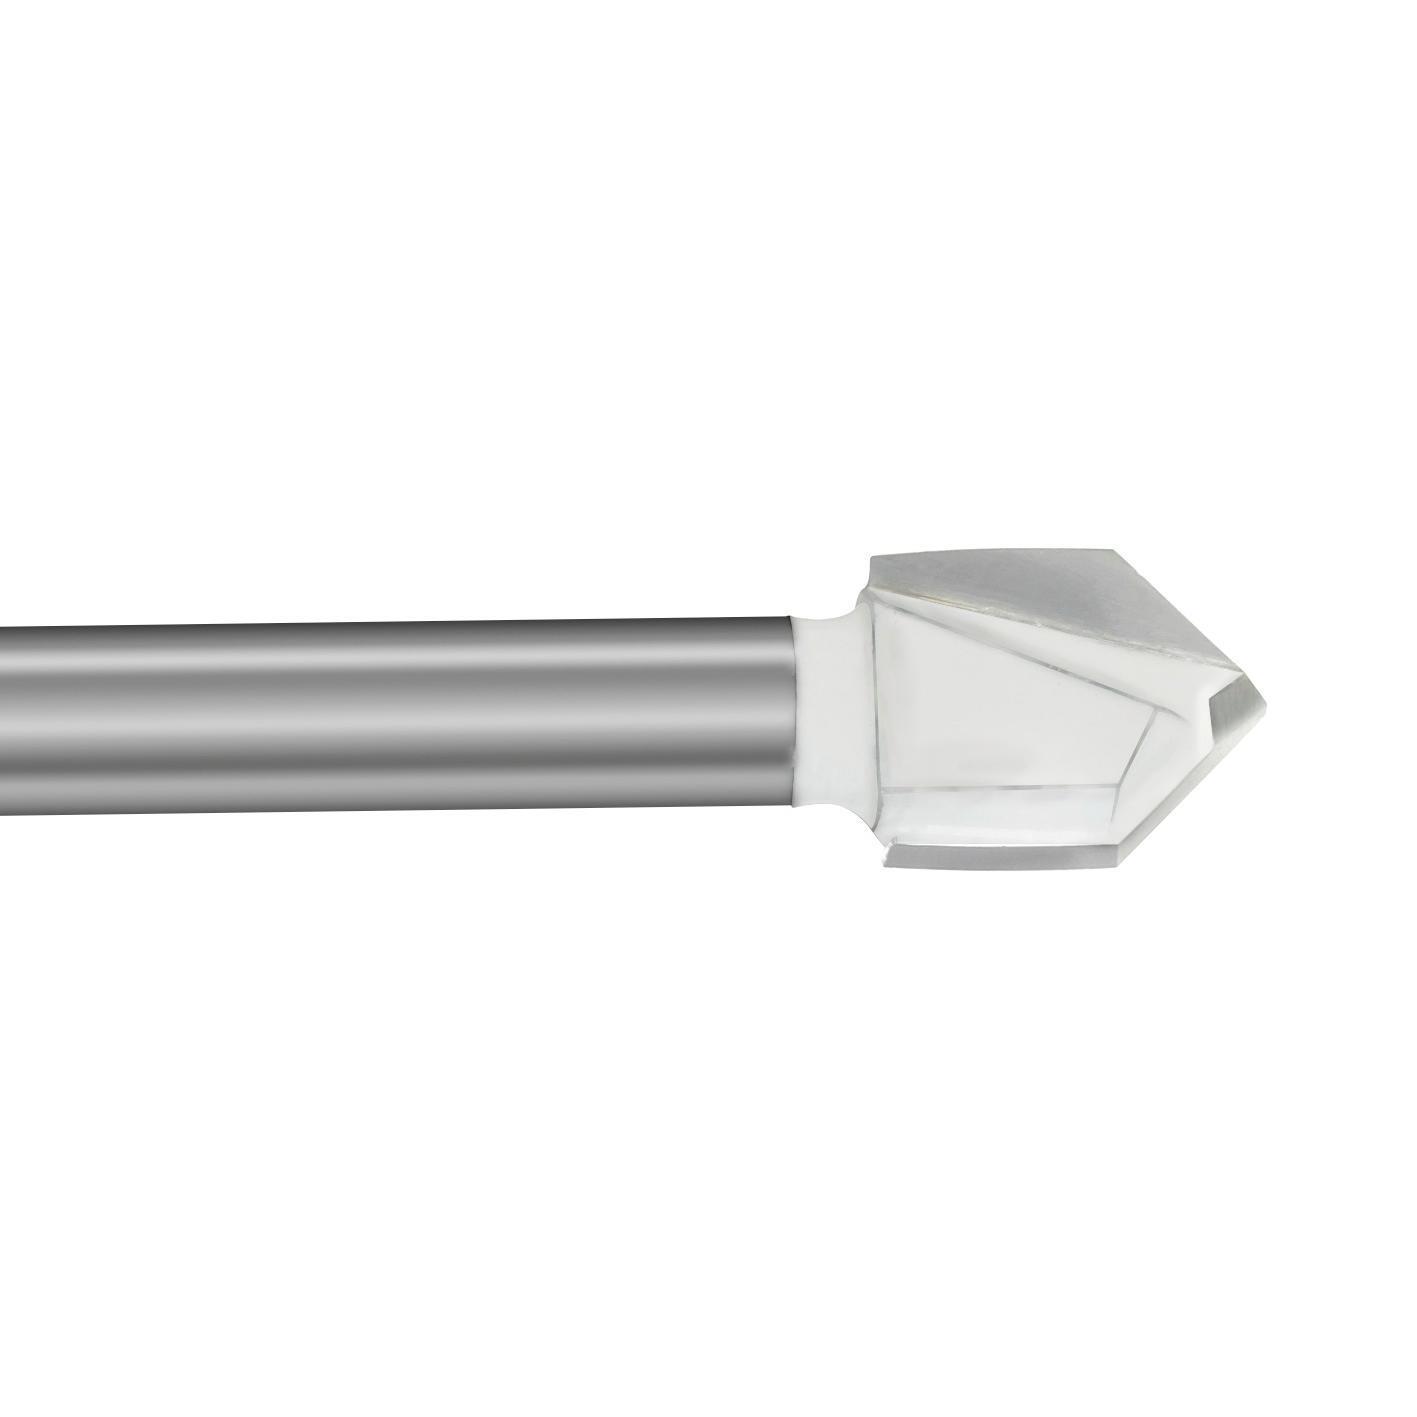 Punta per ceramica / gres porcellanato meno di 200 mm Bosch Ø 5 mm - 2